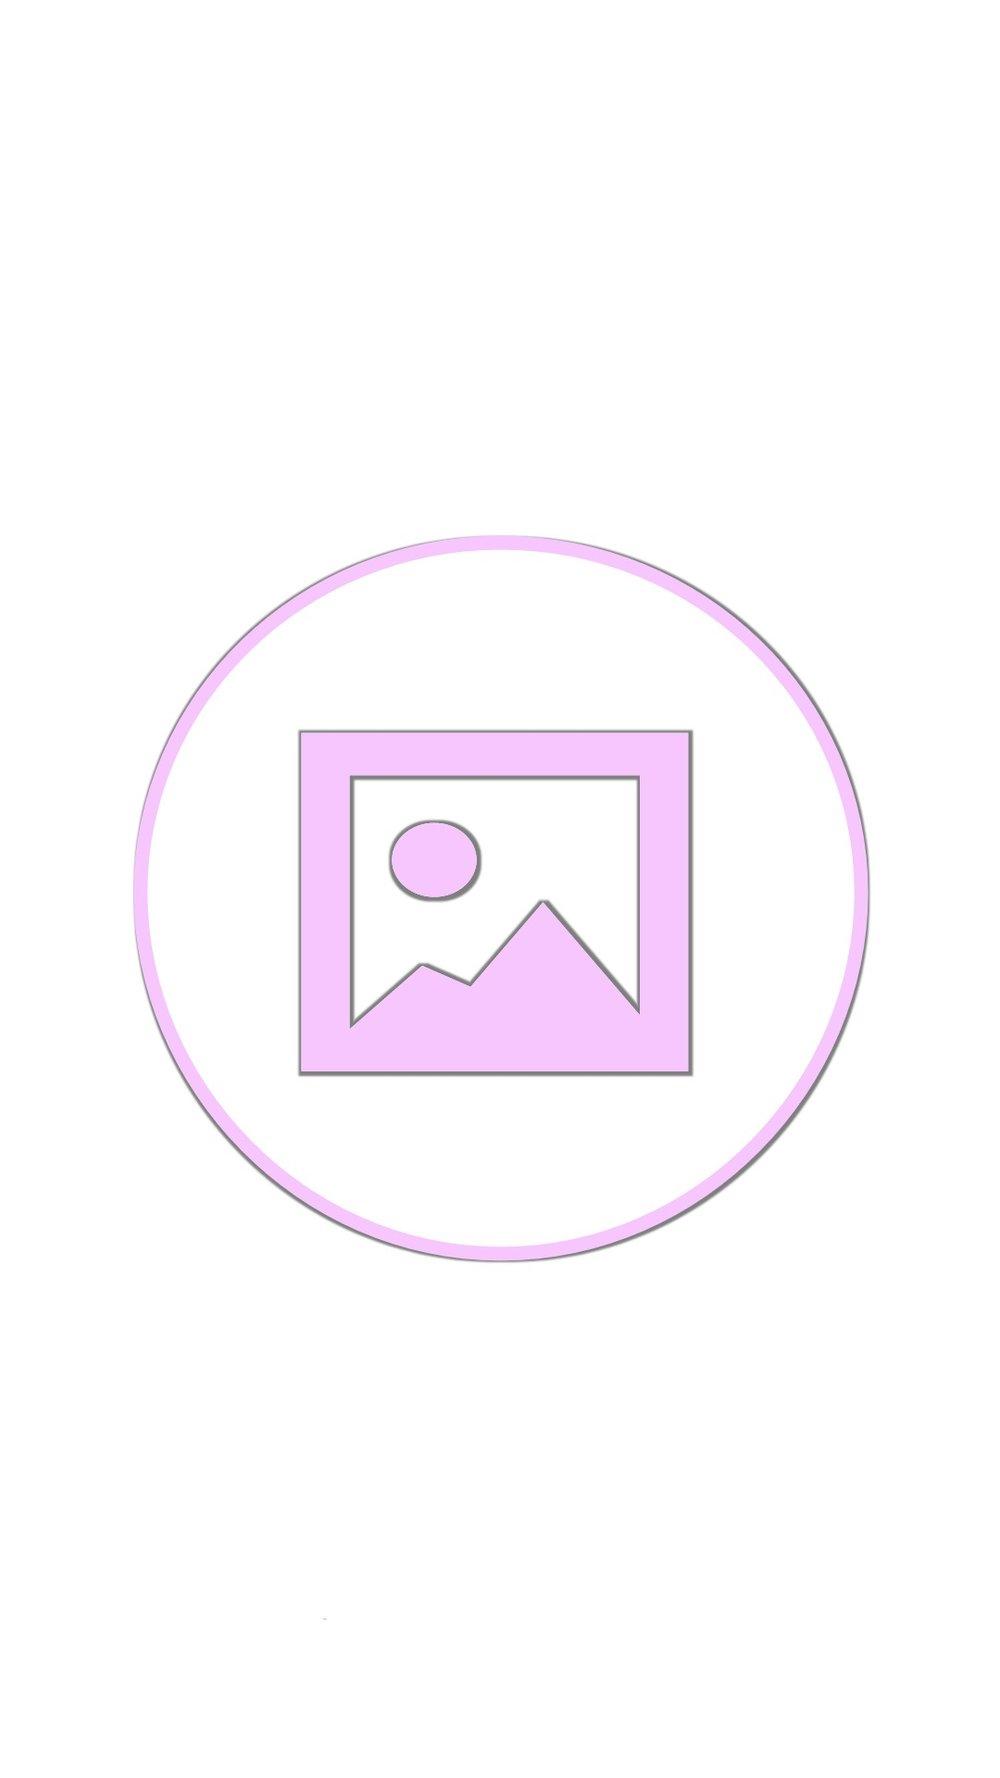 Instagram-cover-baby-photo-pink-lotnotes.com.jpg